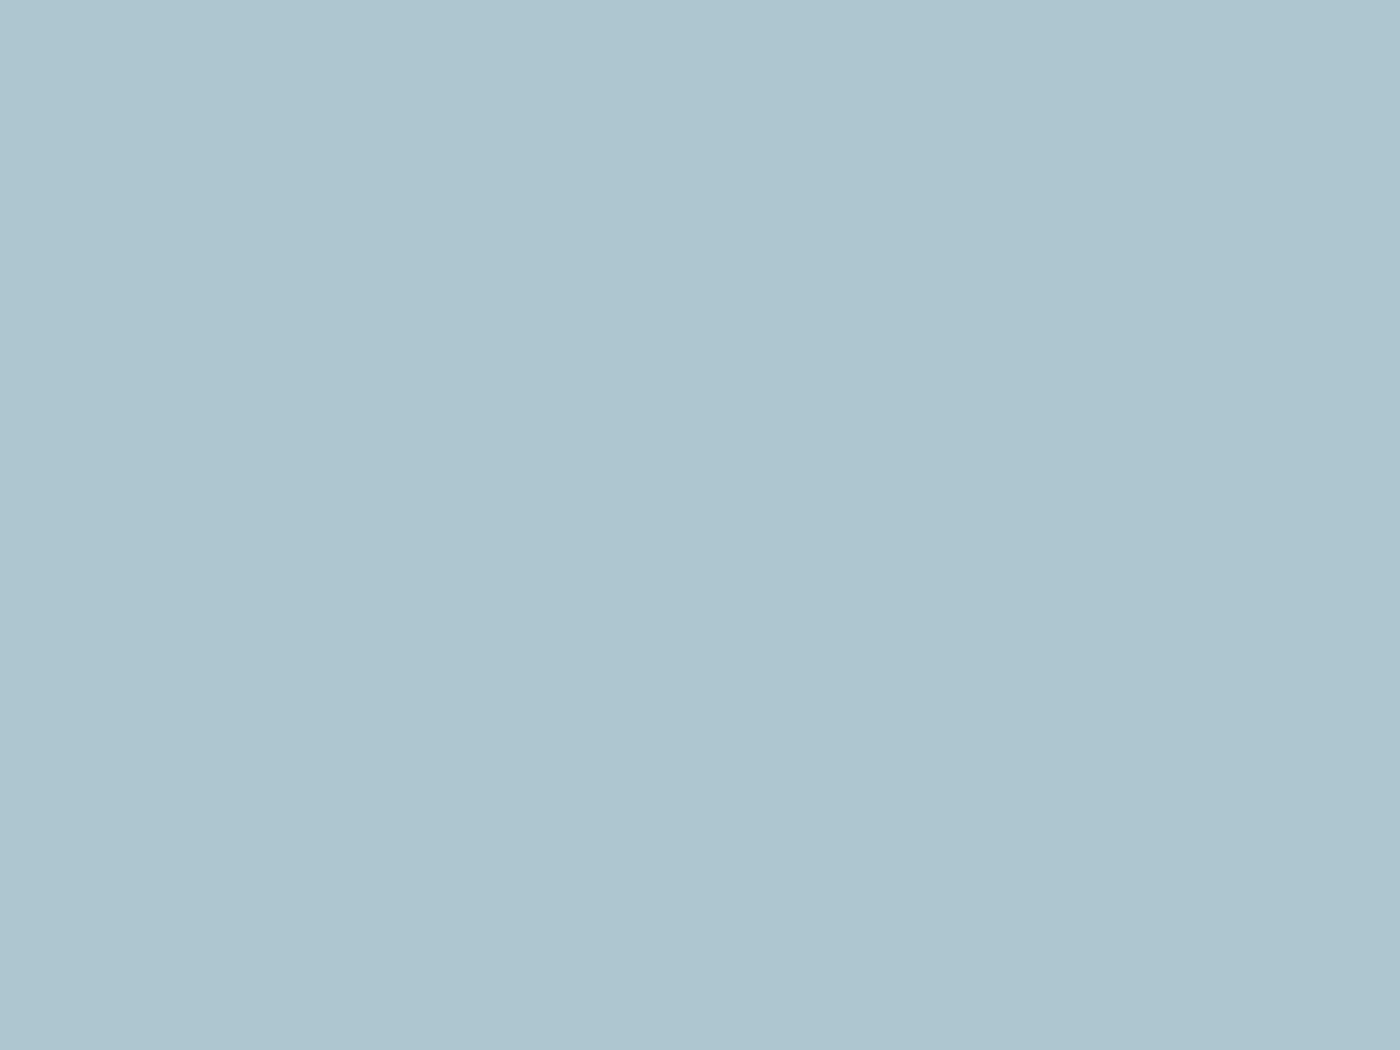 1400x1050 Pastel Blue Solid Color Background